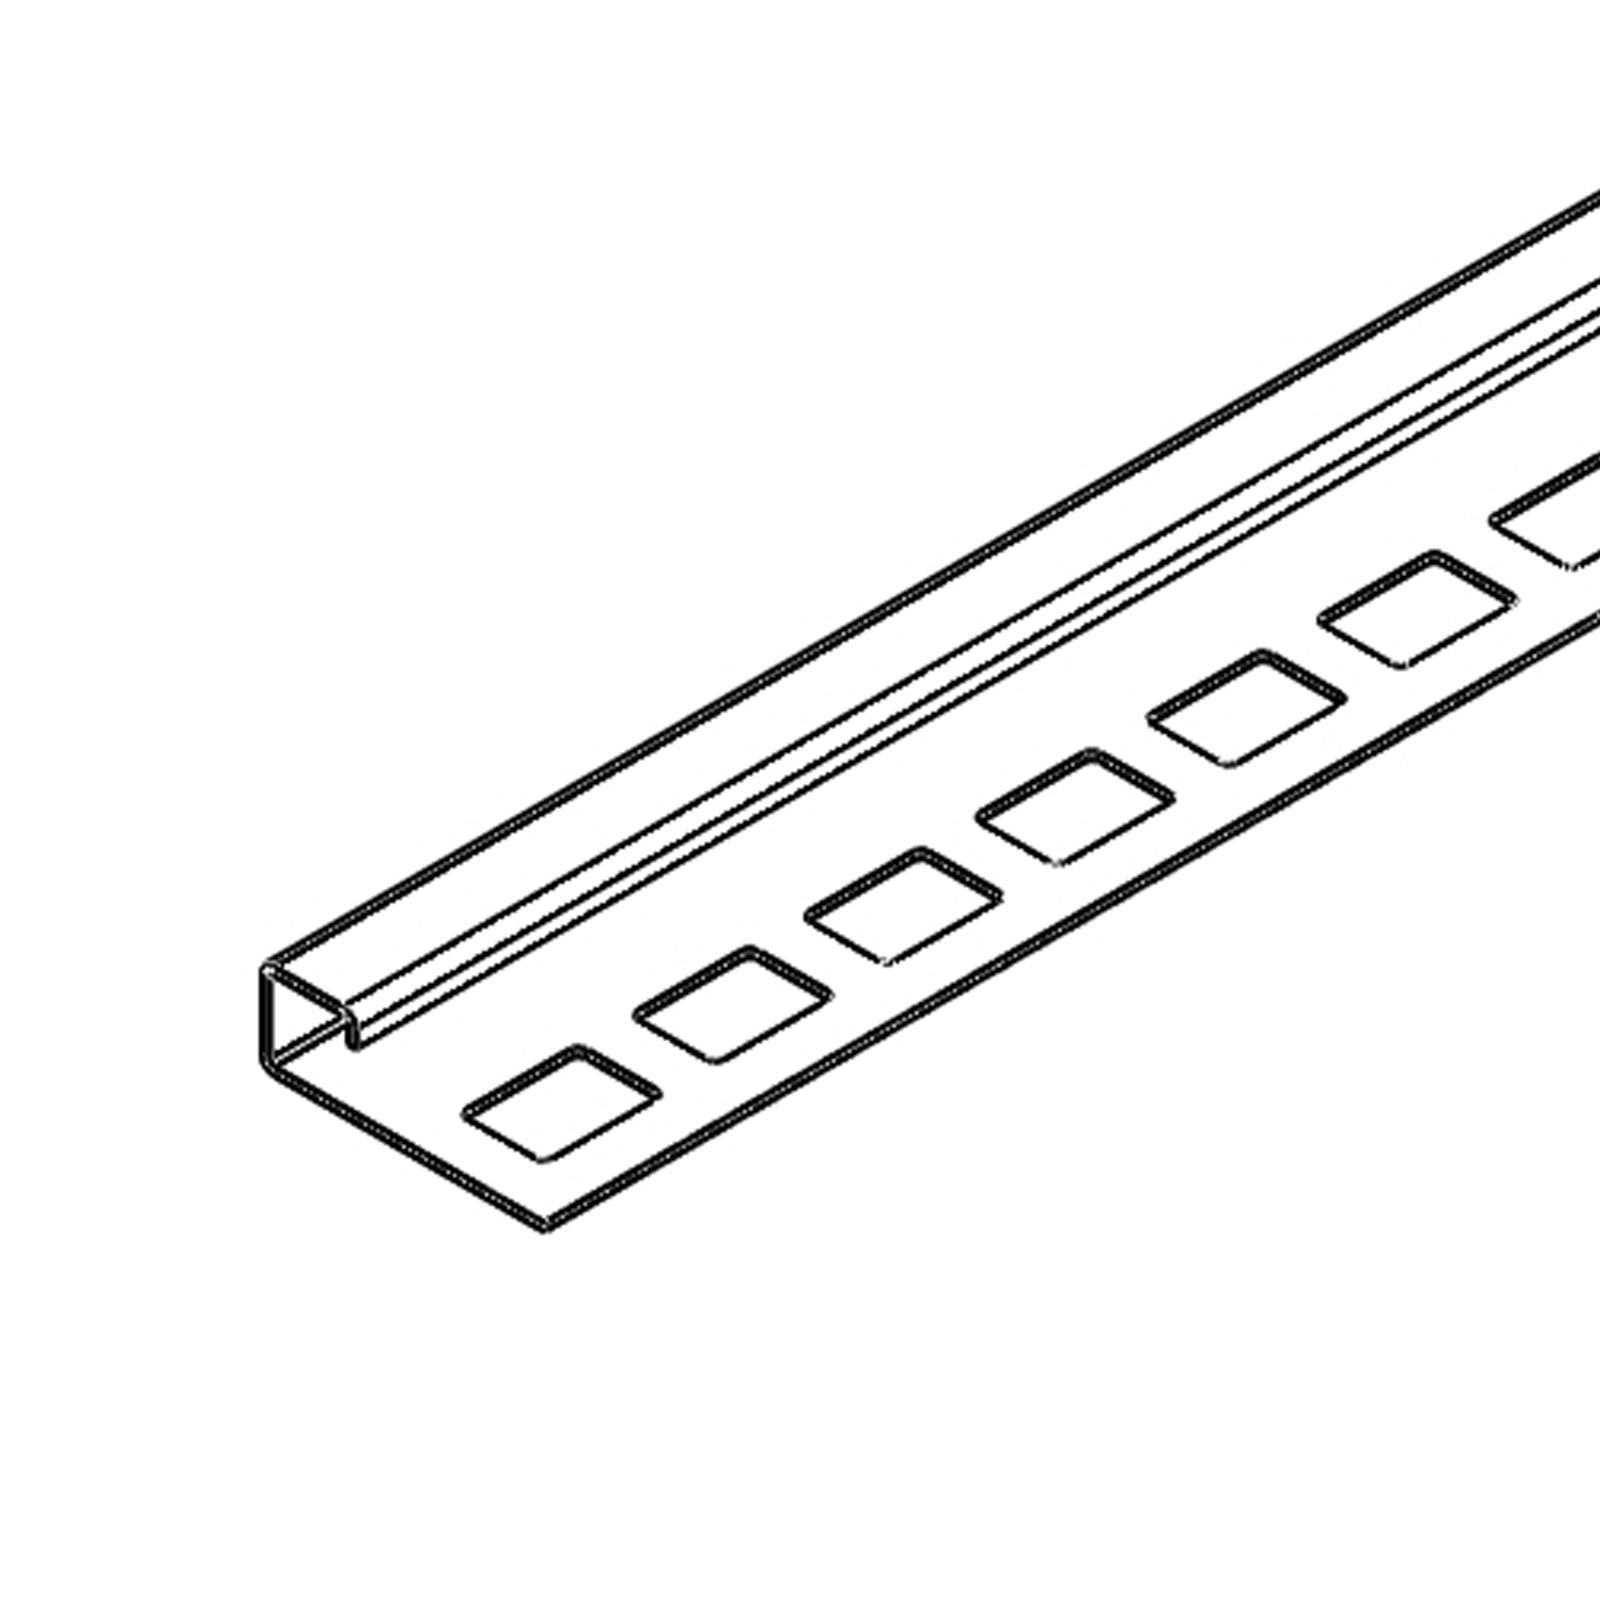 3-60-m-HORI-Fliesenprofil-Fliesen-Schiene-Edelstahl-V2A-Quadro-Winkel-250cm Indexbild 15